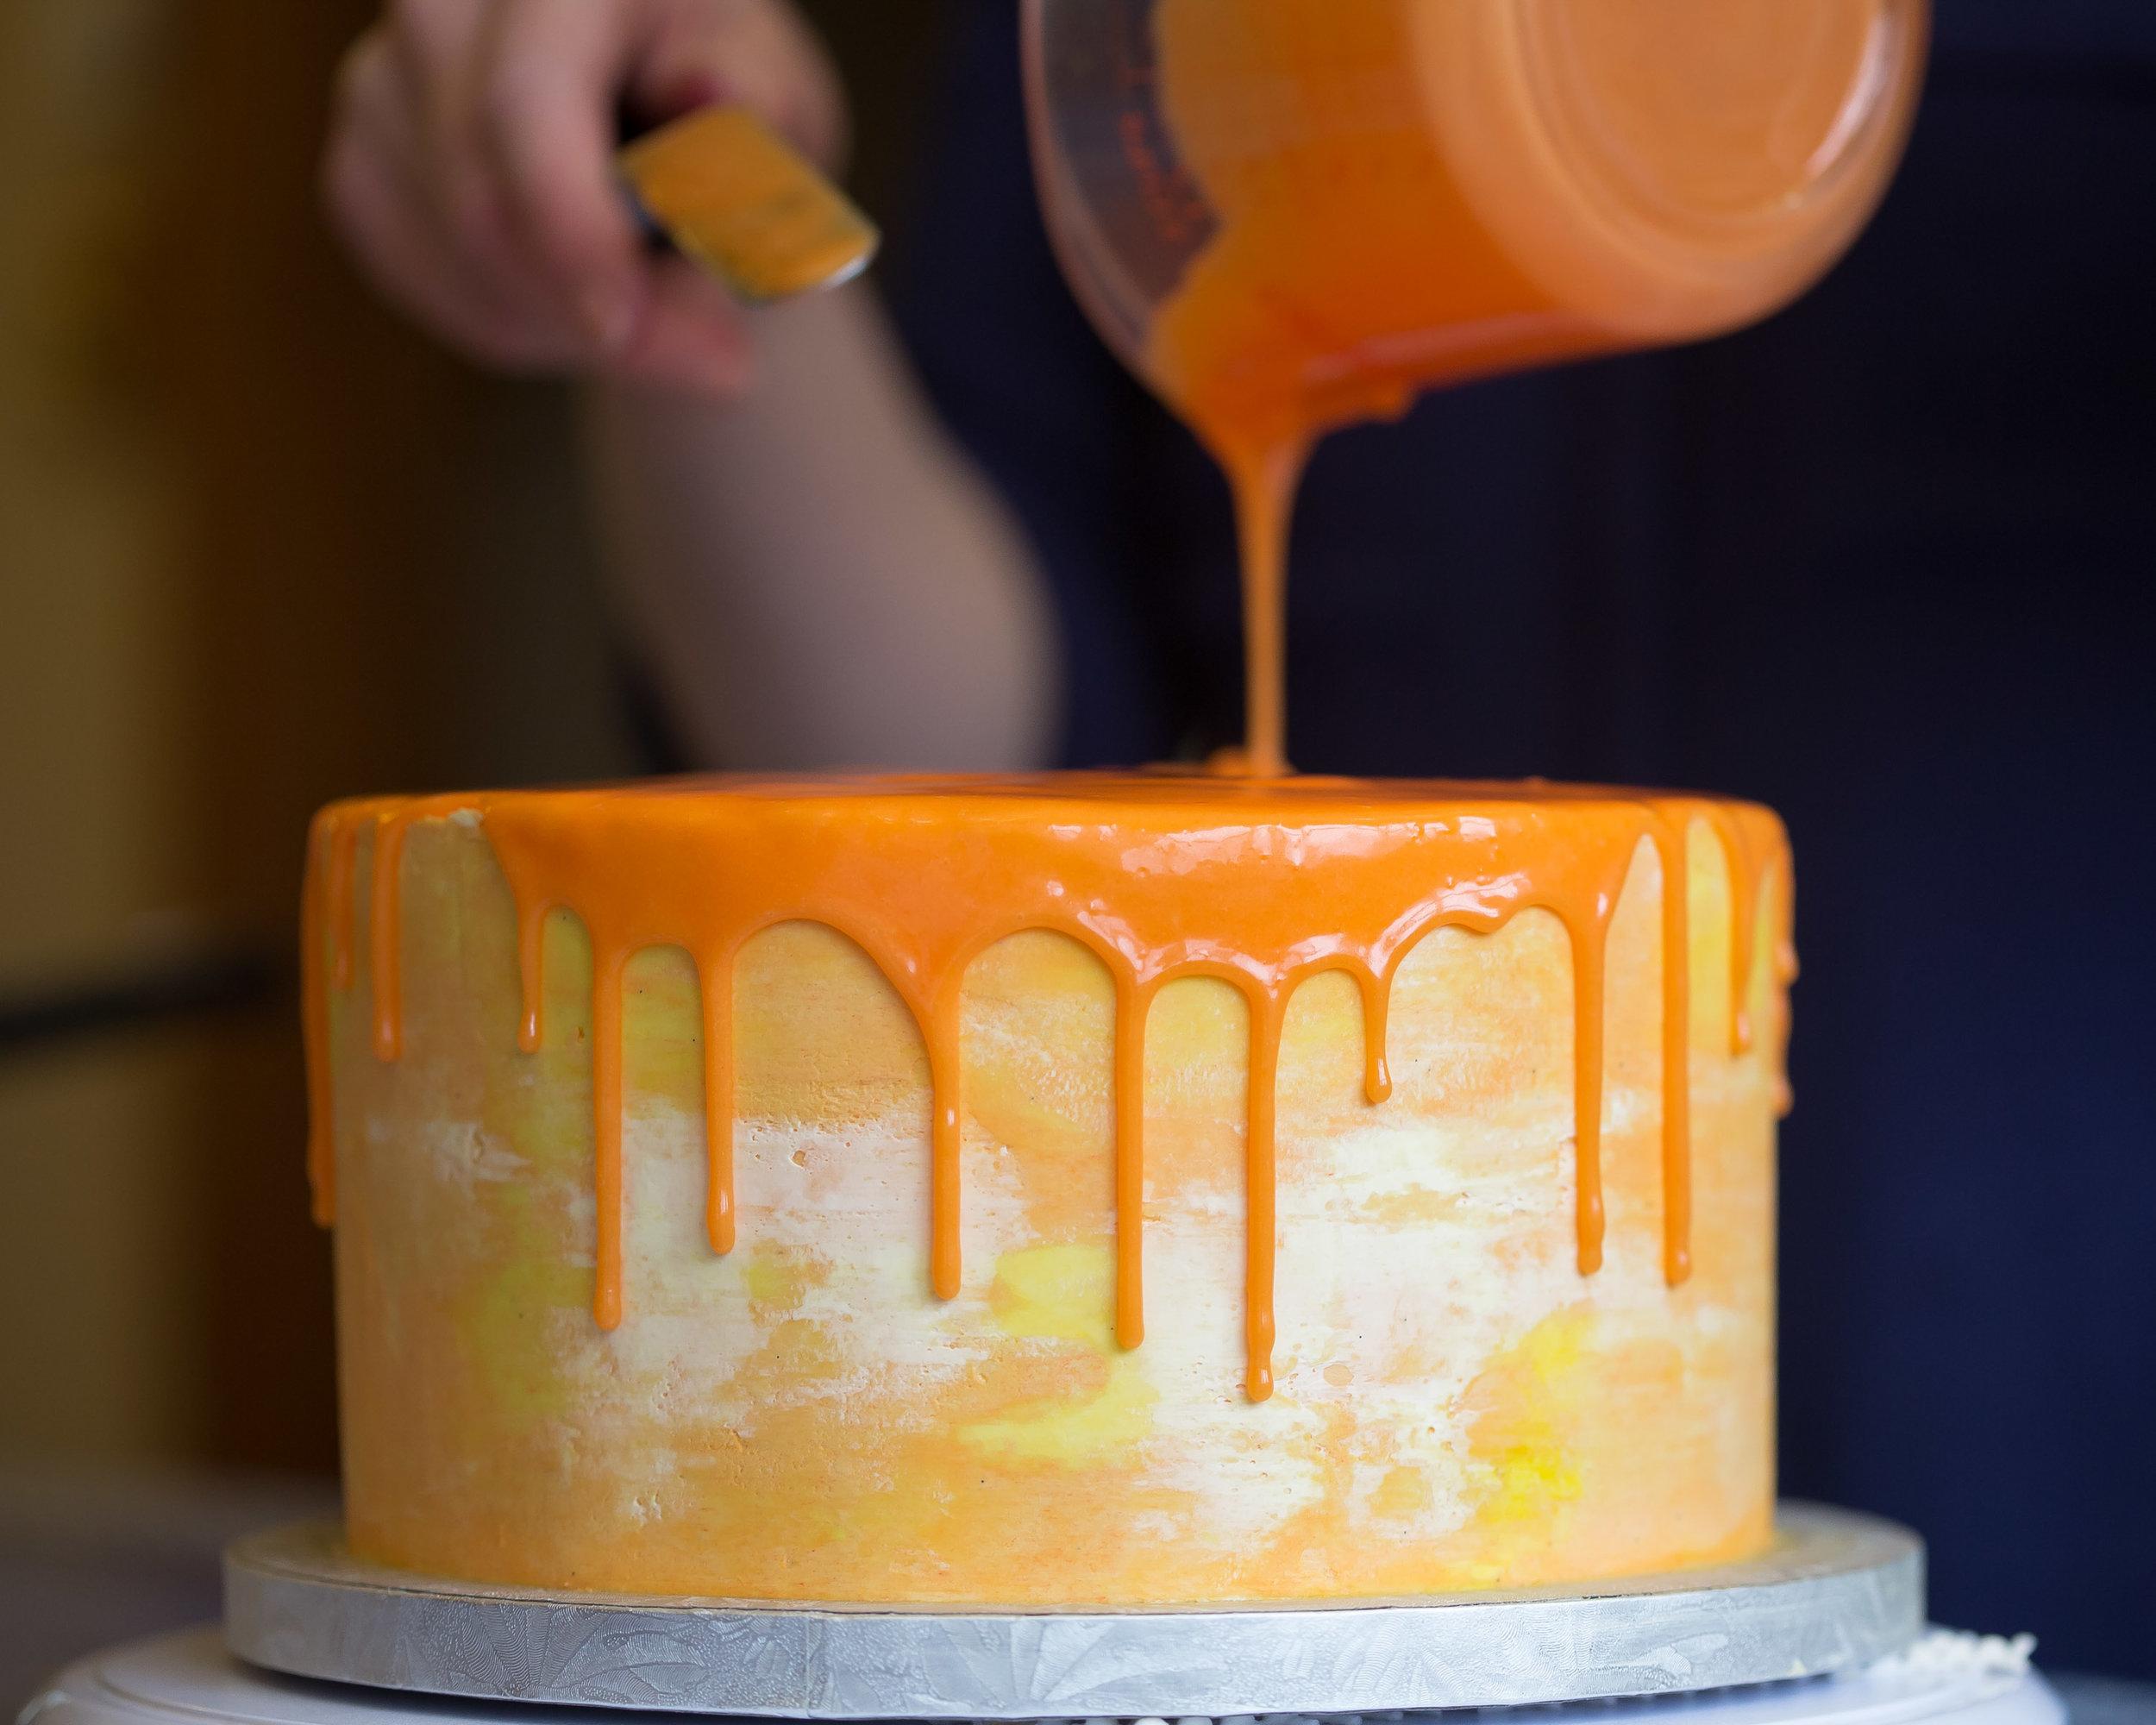 drizzle cake making commercial photographer wairarapa.jpg